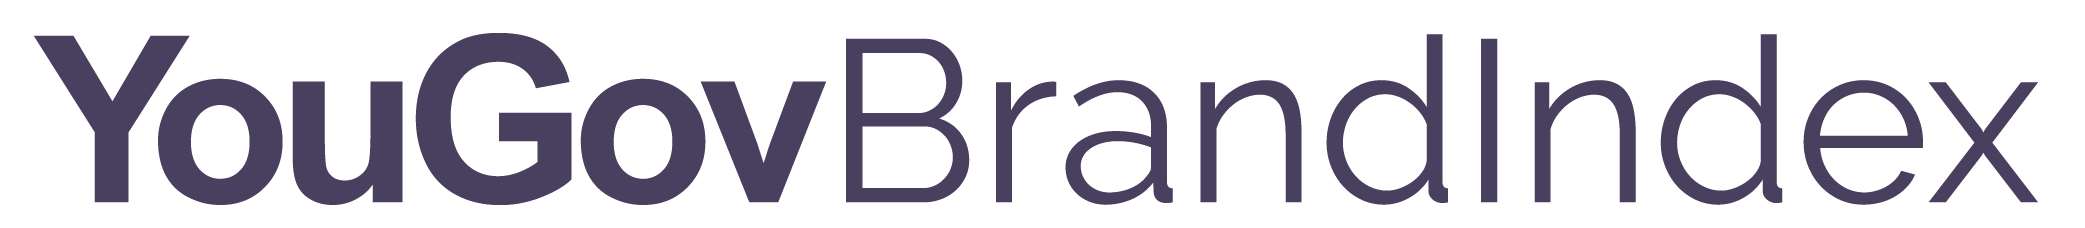 YouGov BrandIndex